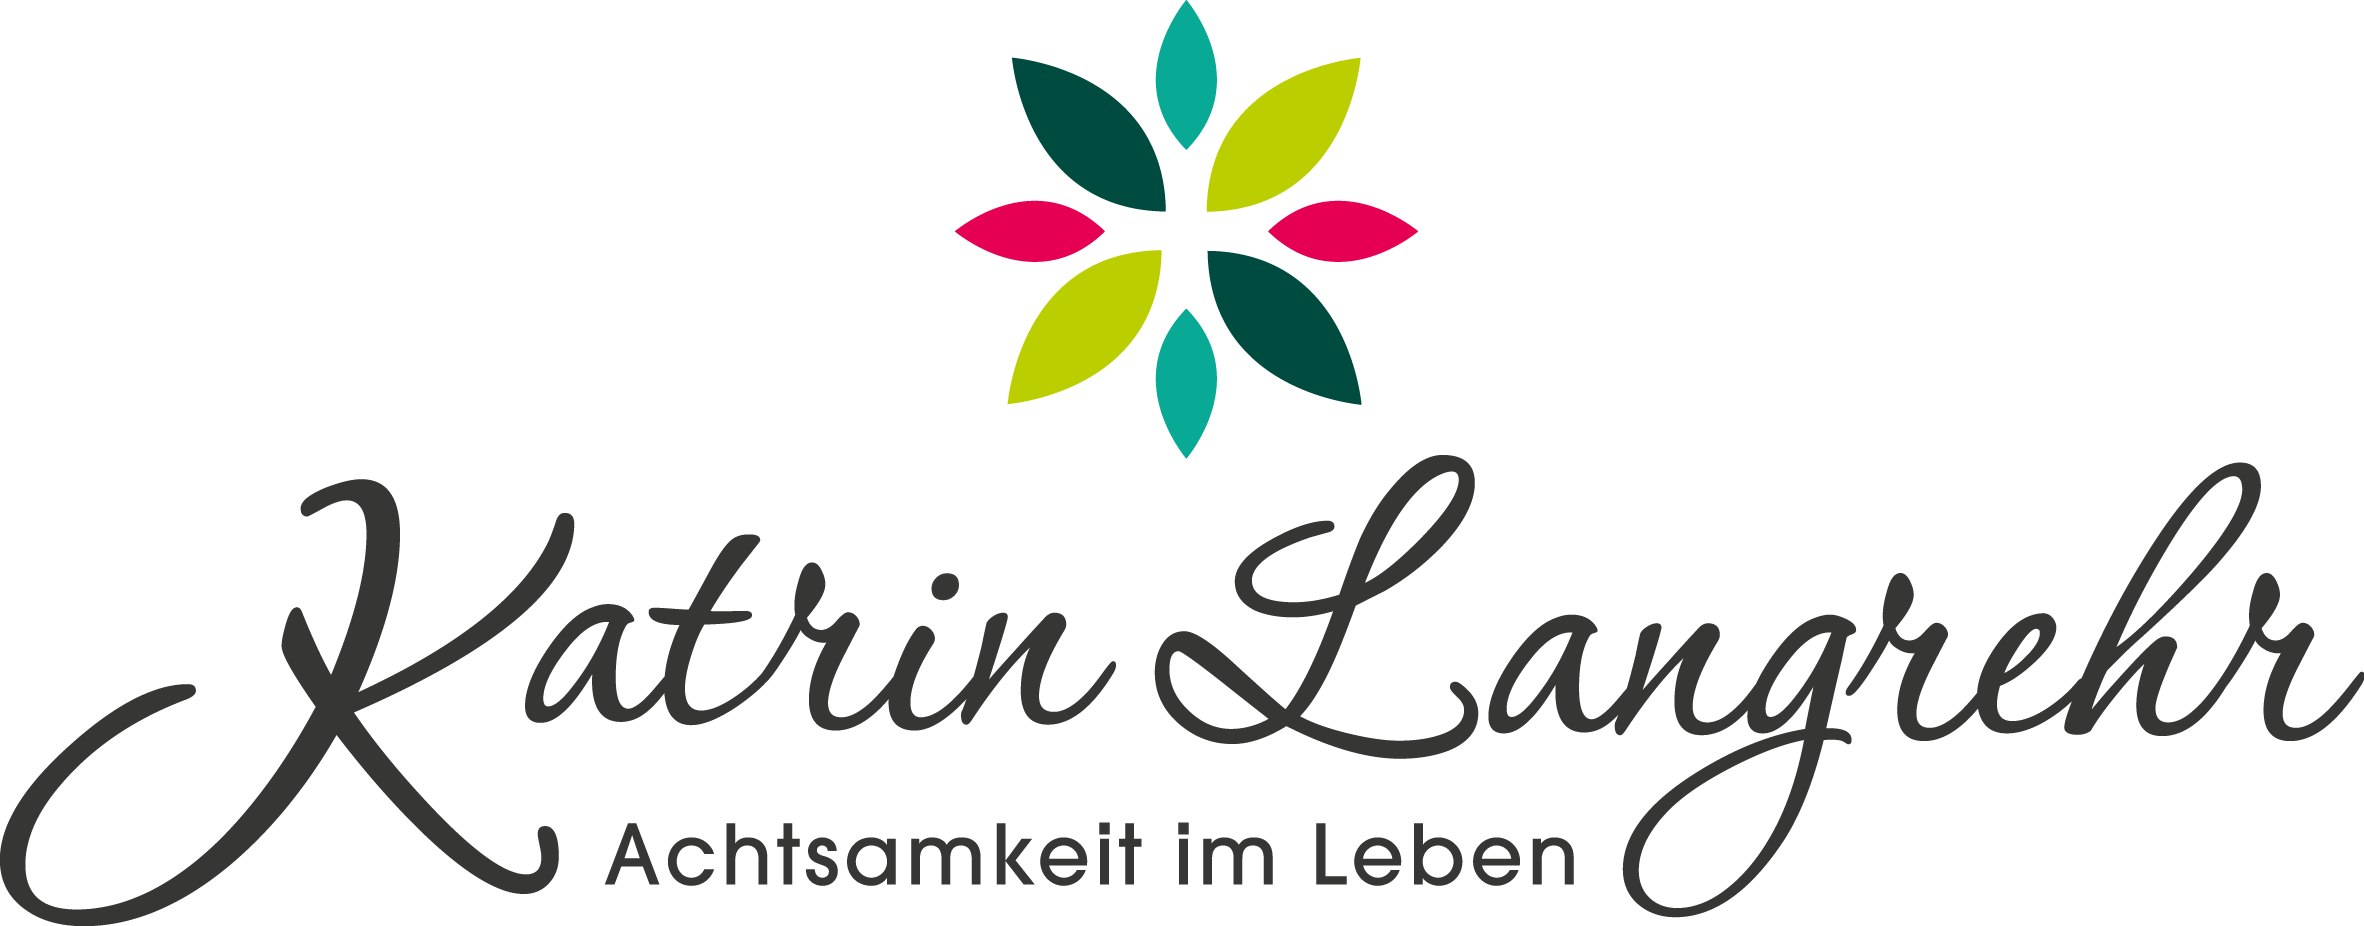 Katrin Langrehr